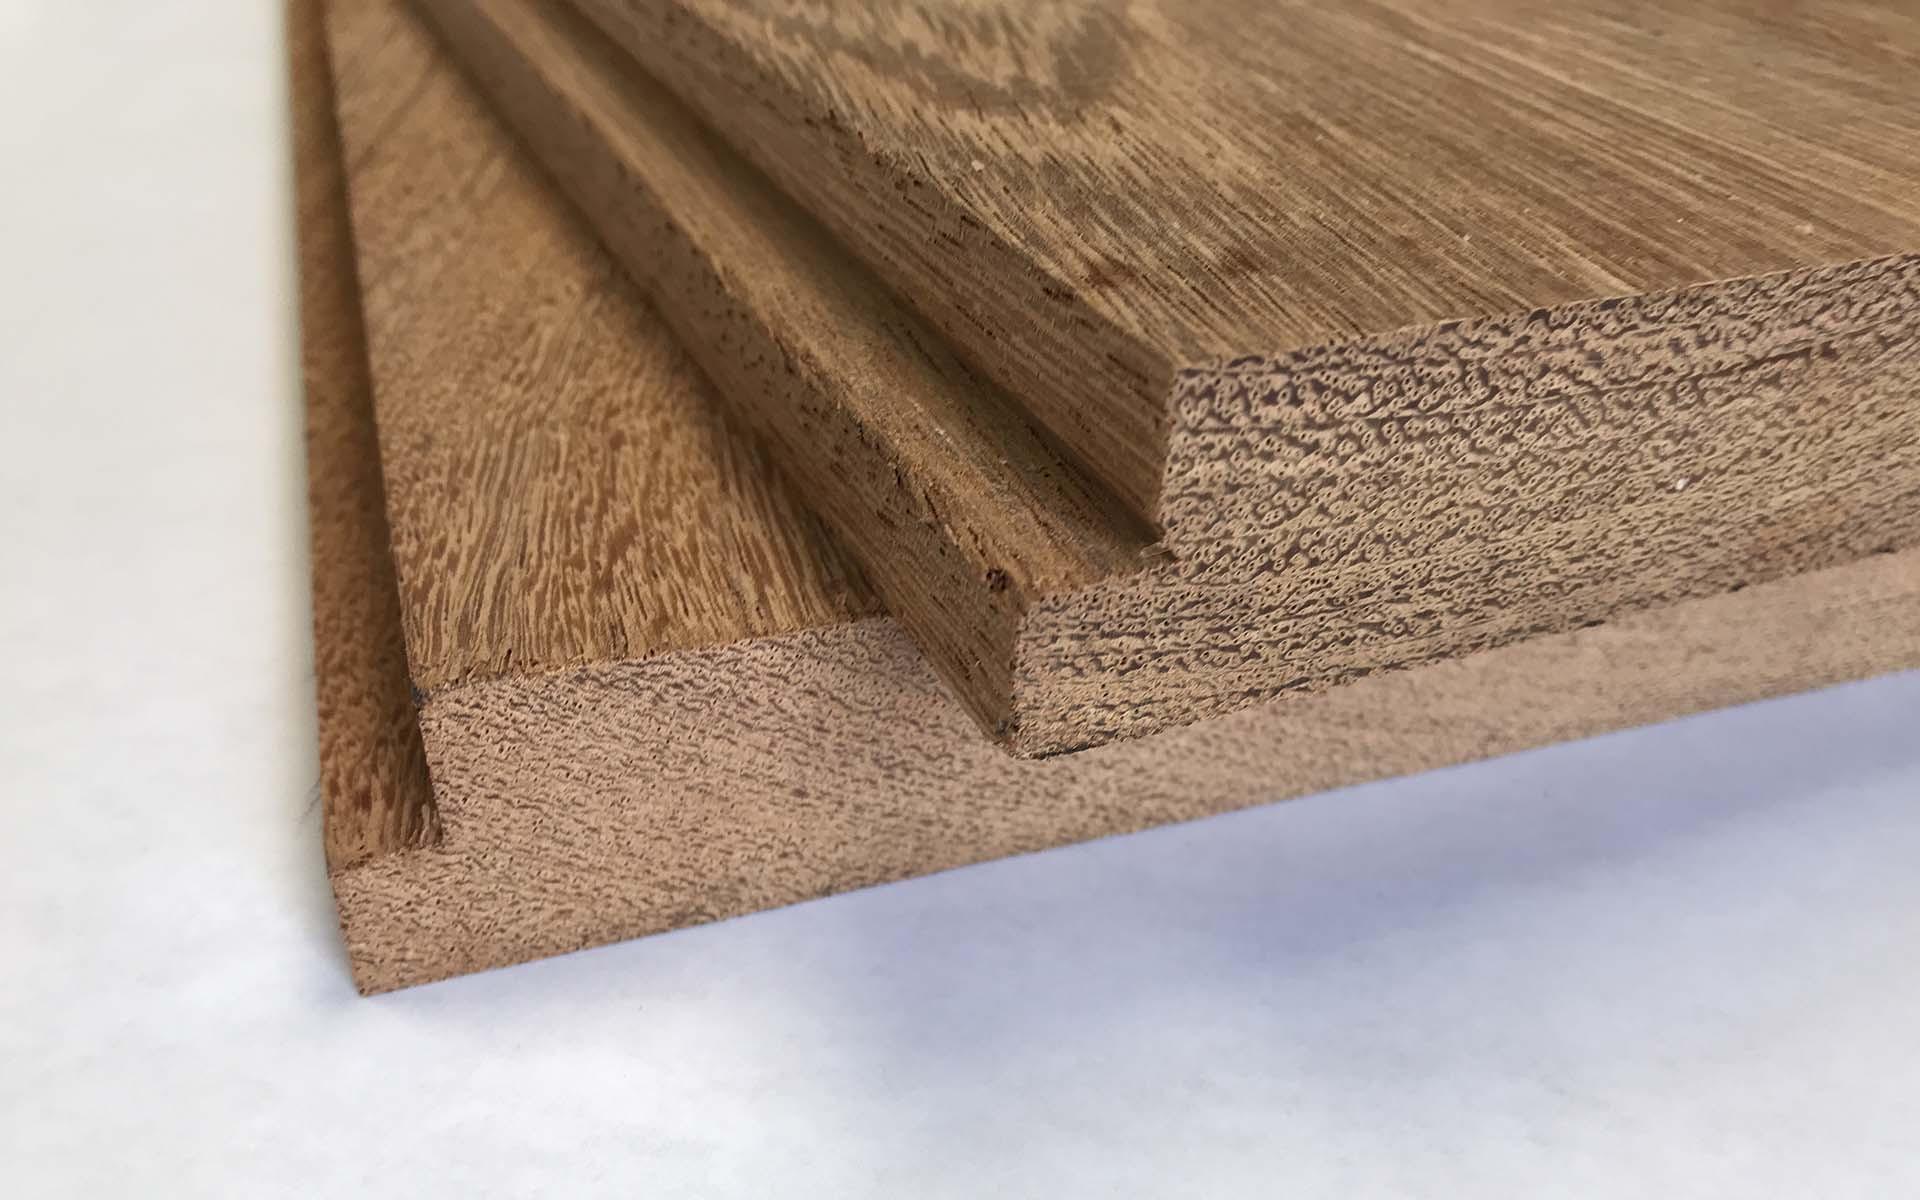 arizona hardwood floor supply of buy trailer decking apitong shiplap rough boards truck flooring regarding 3 angelim pedra shiplap close up